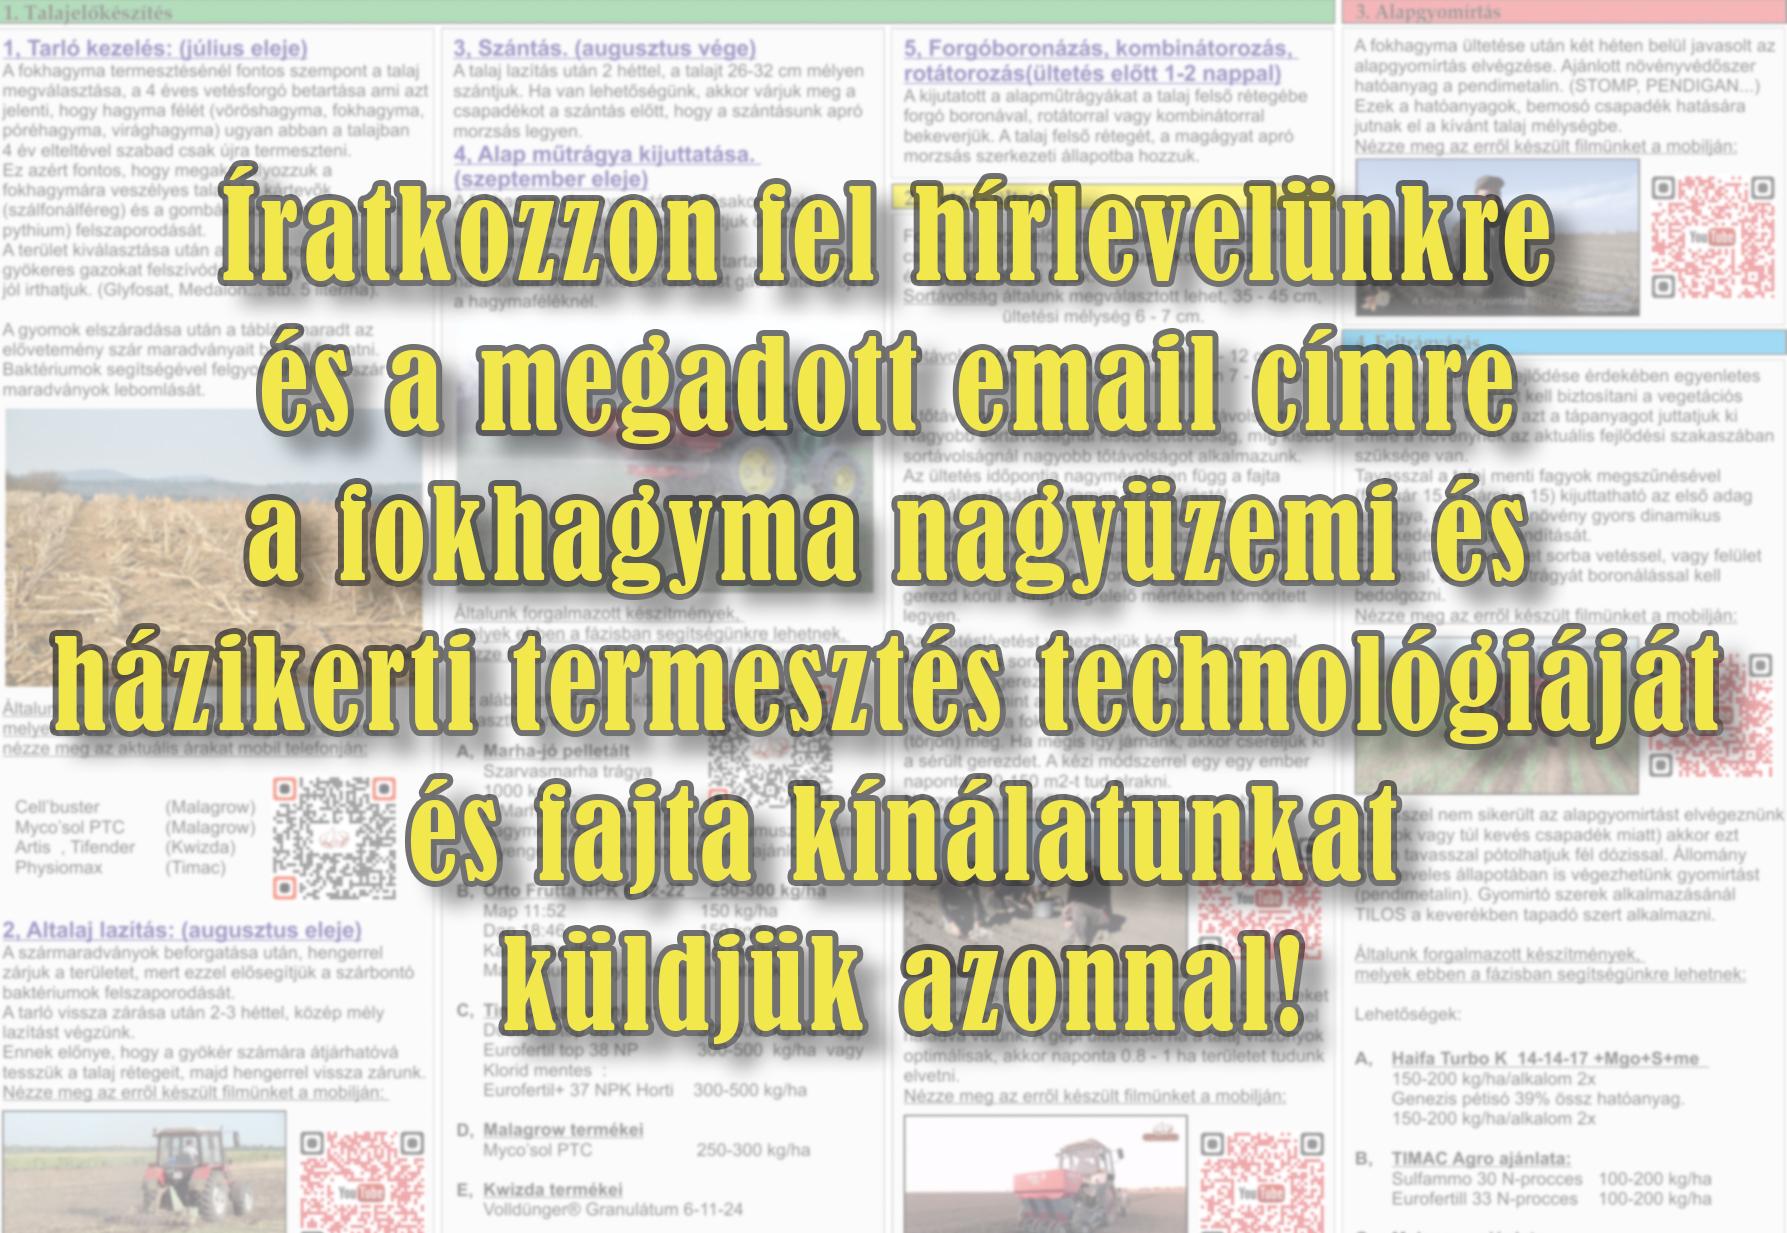 kertiszerszamok-webshop.hu